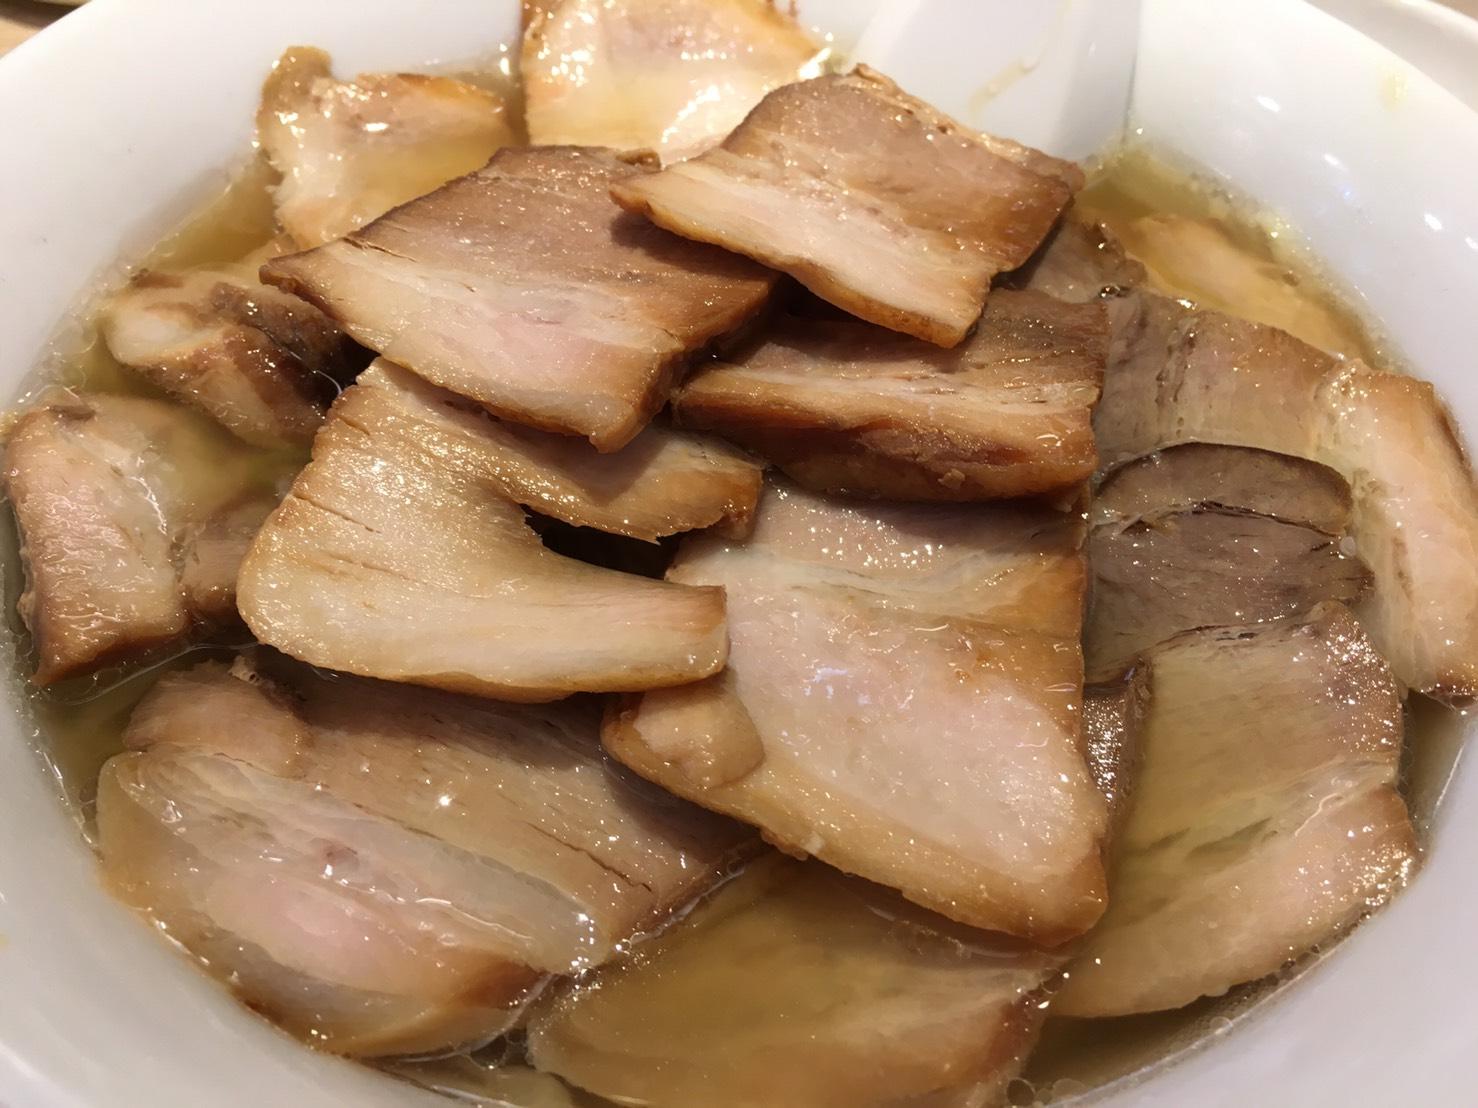 <span>そして今日も肉を食べる</span>『オクジャ/okja』